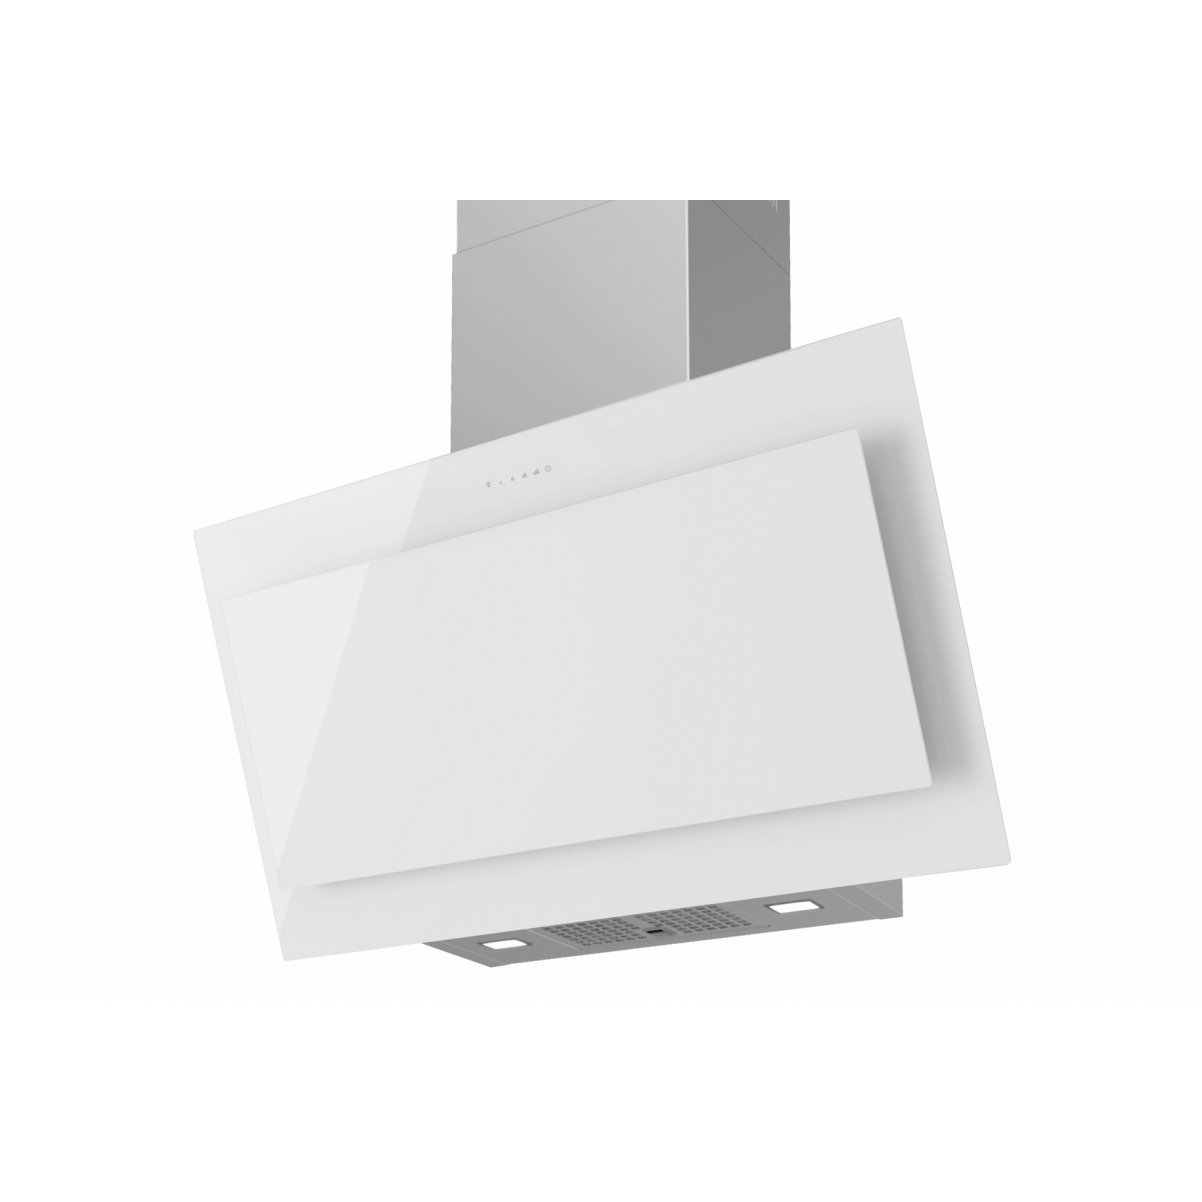 Premium line vertikal köksfläkt Vektor 60cm/90 cm vit/svart glas